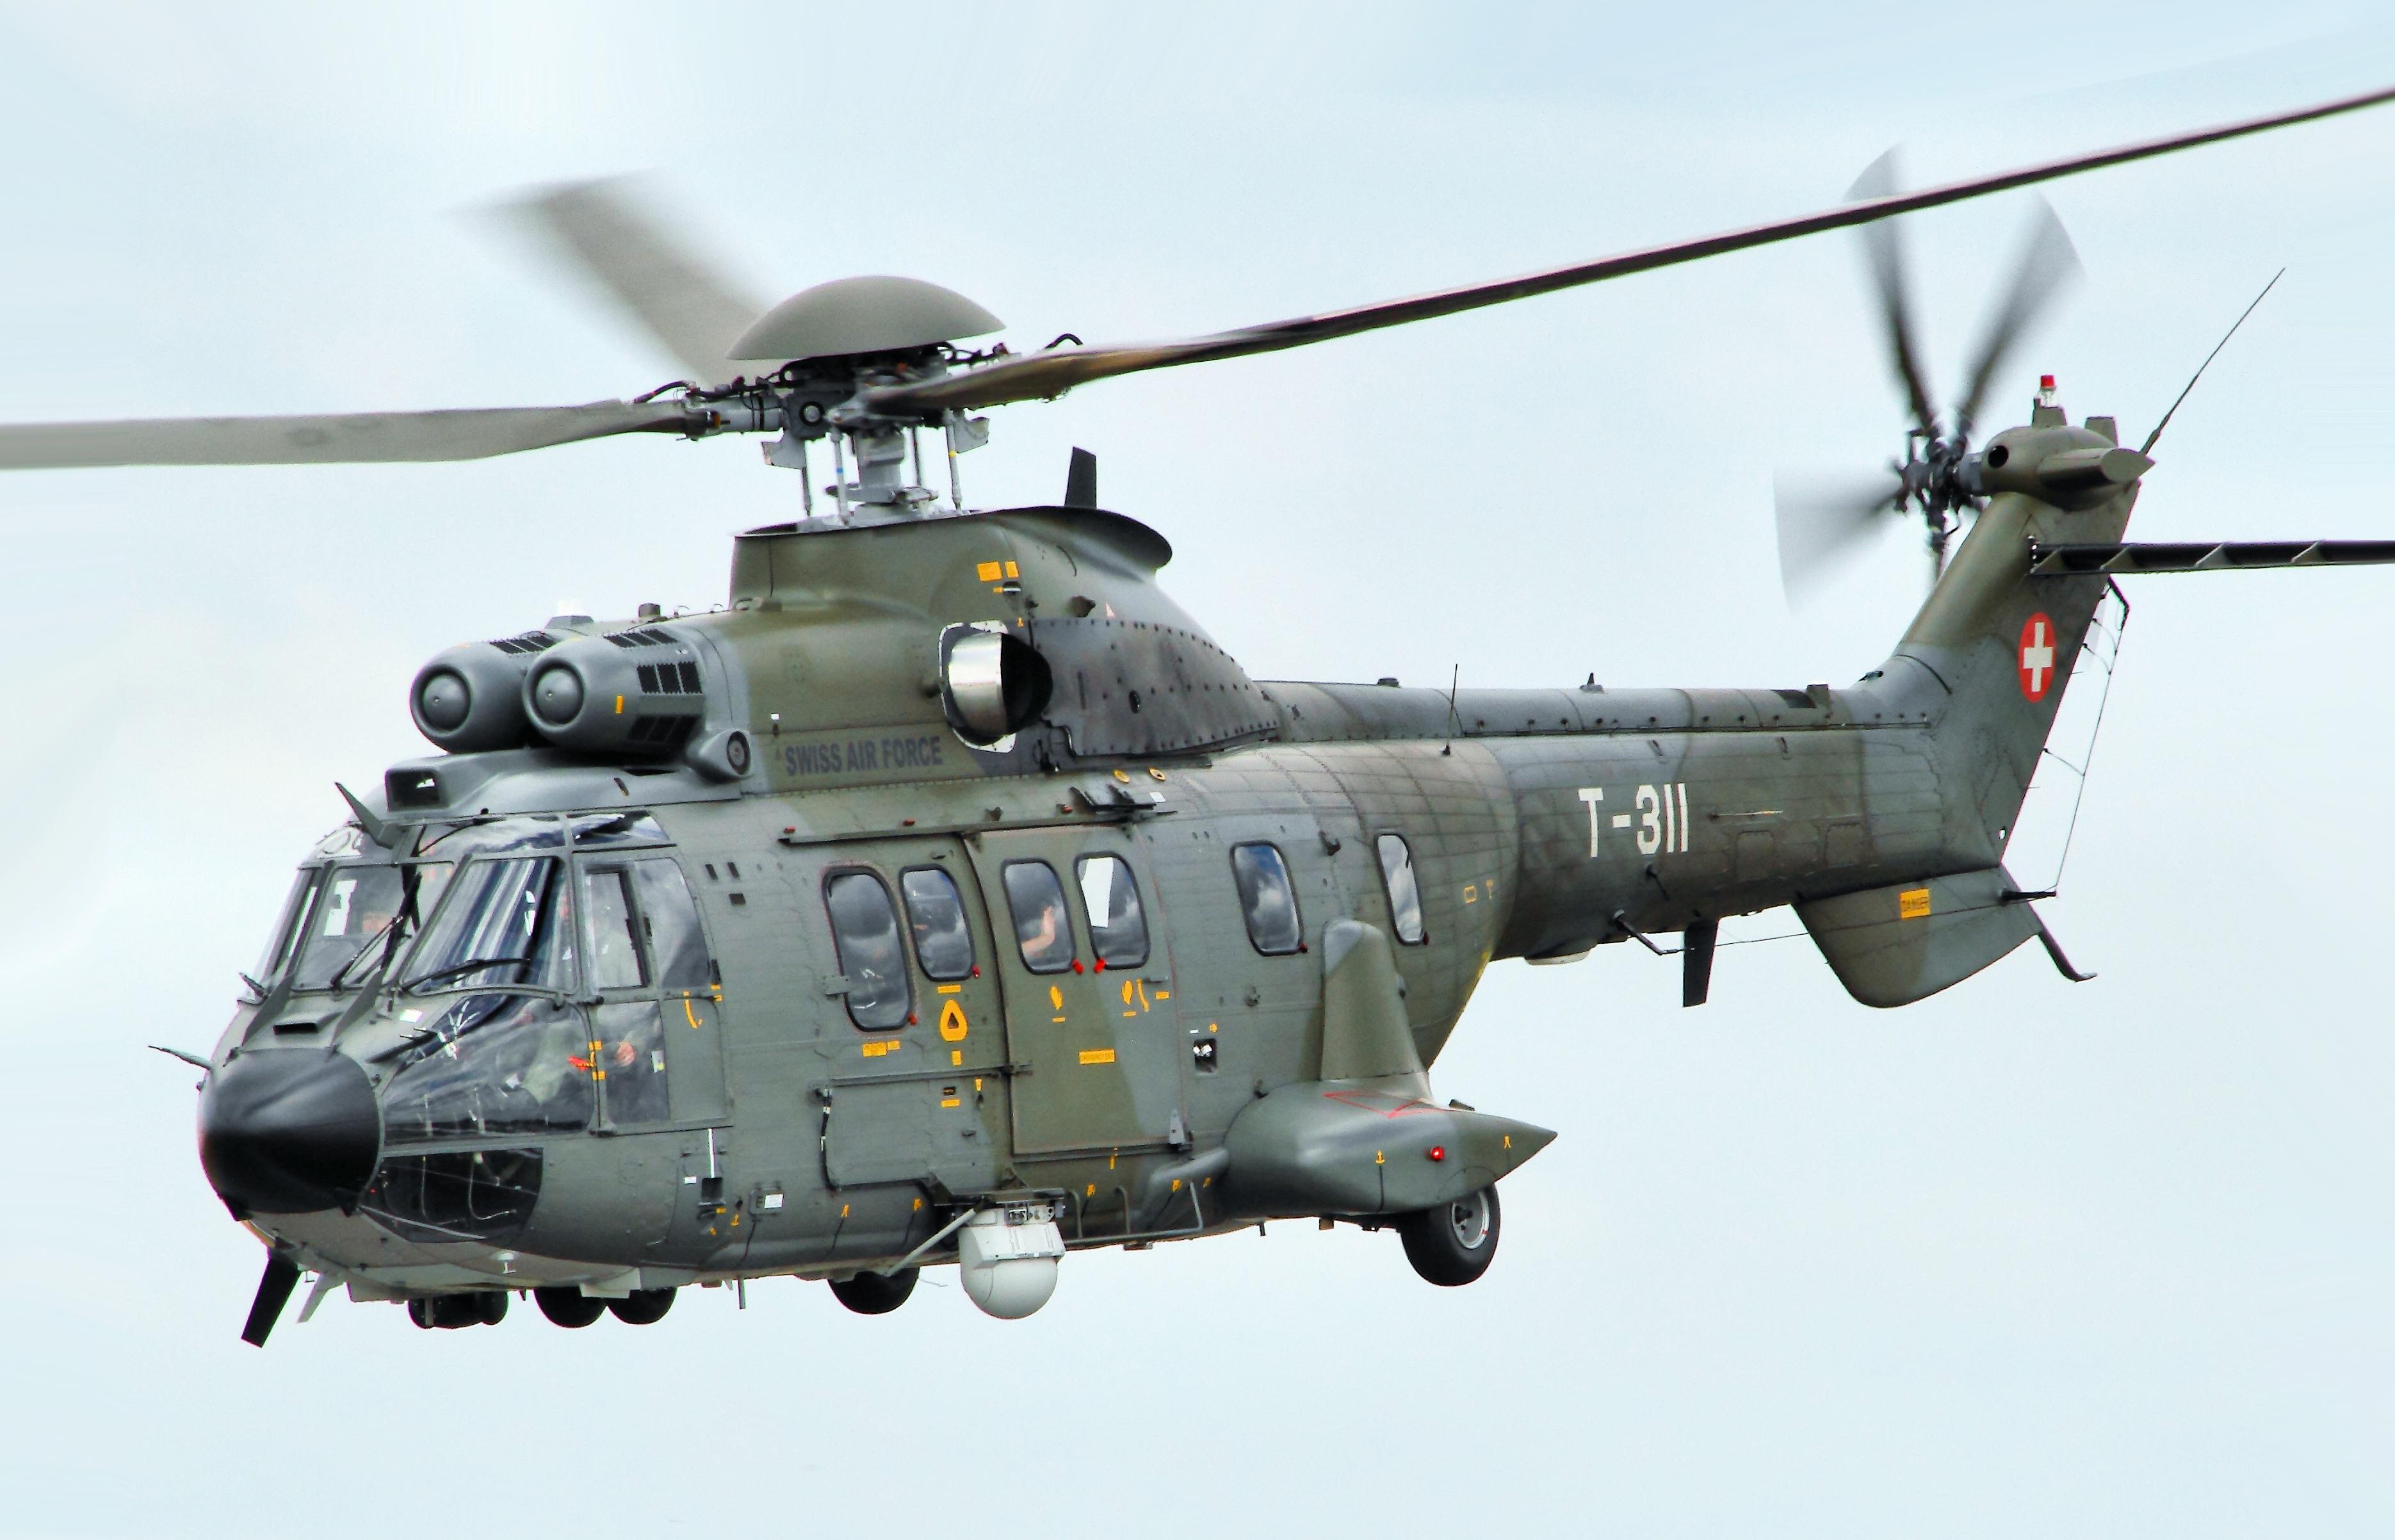 oscuro Plaga silencio  Eurocopter AS332 Super Puma - Wikipedia